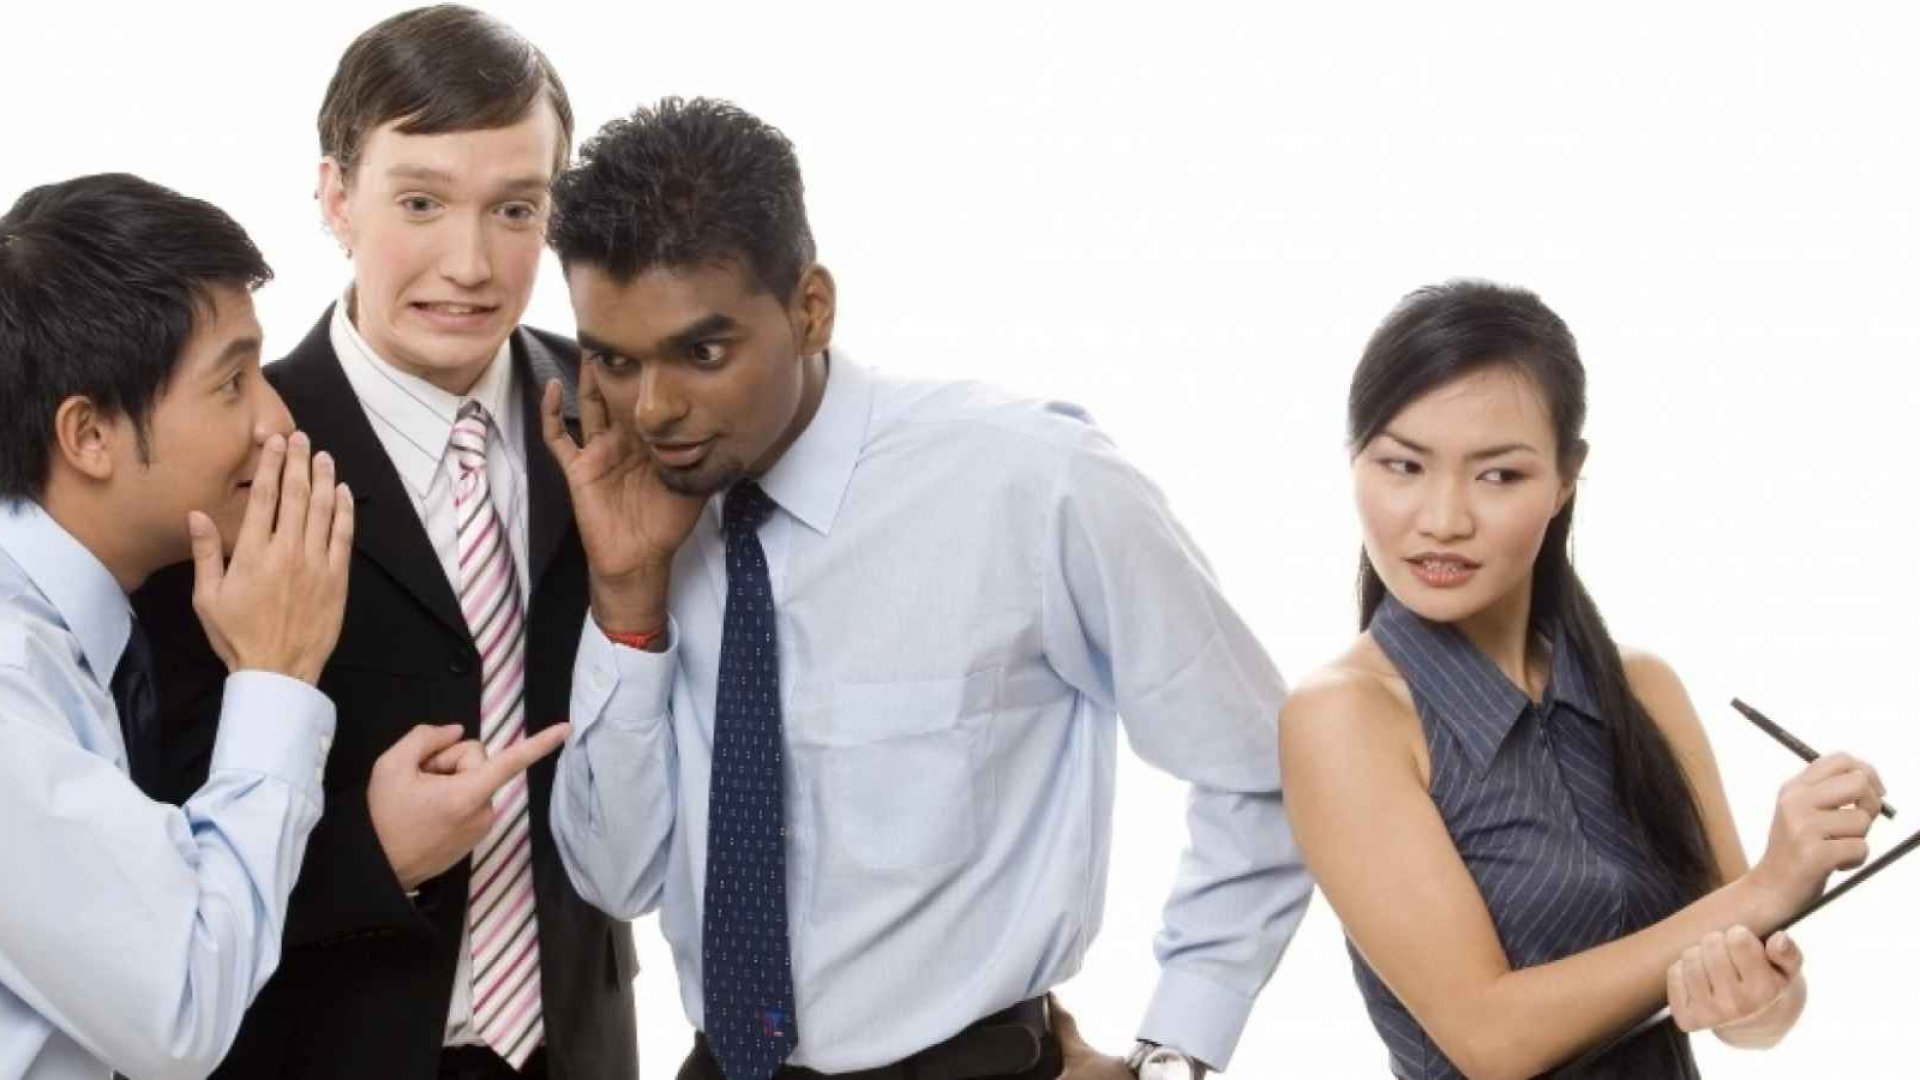 10 Smart Ways to Manage Workplace Gossip